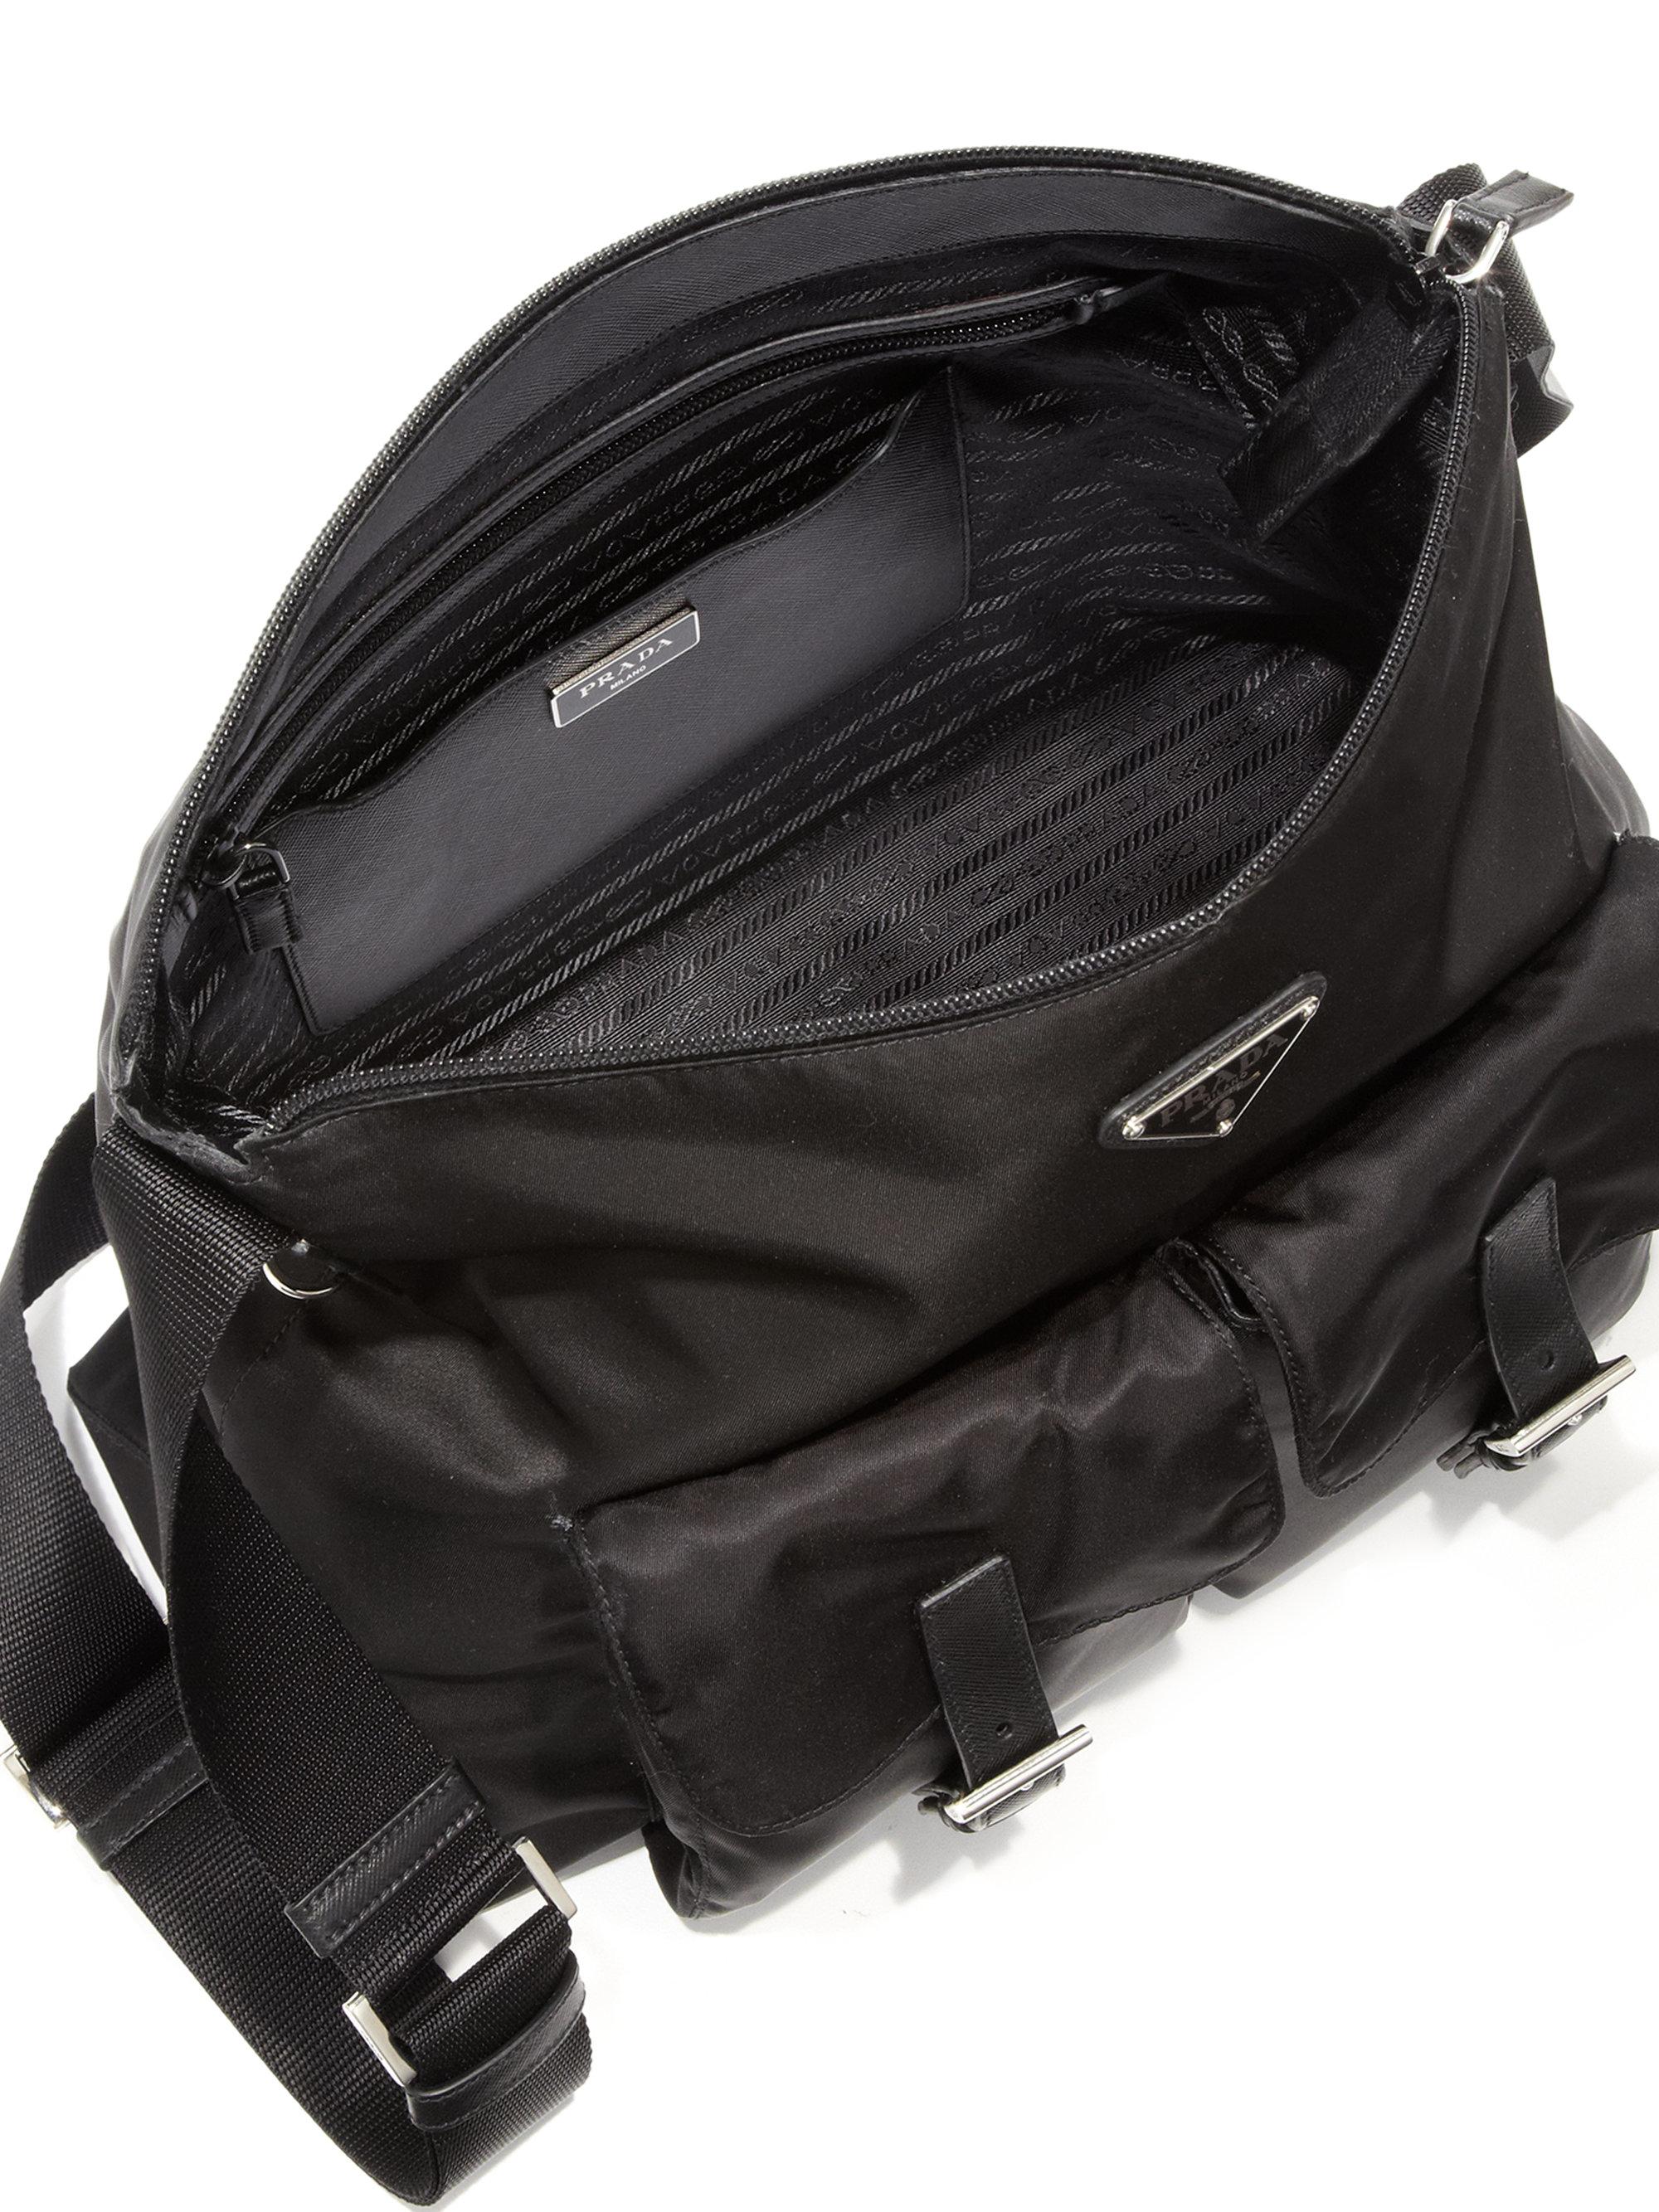 baby blue prada bag - prada messenger bag nylon and leather bag